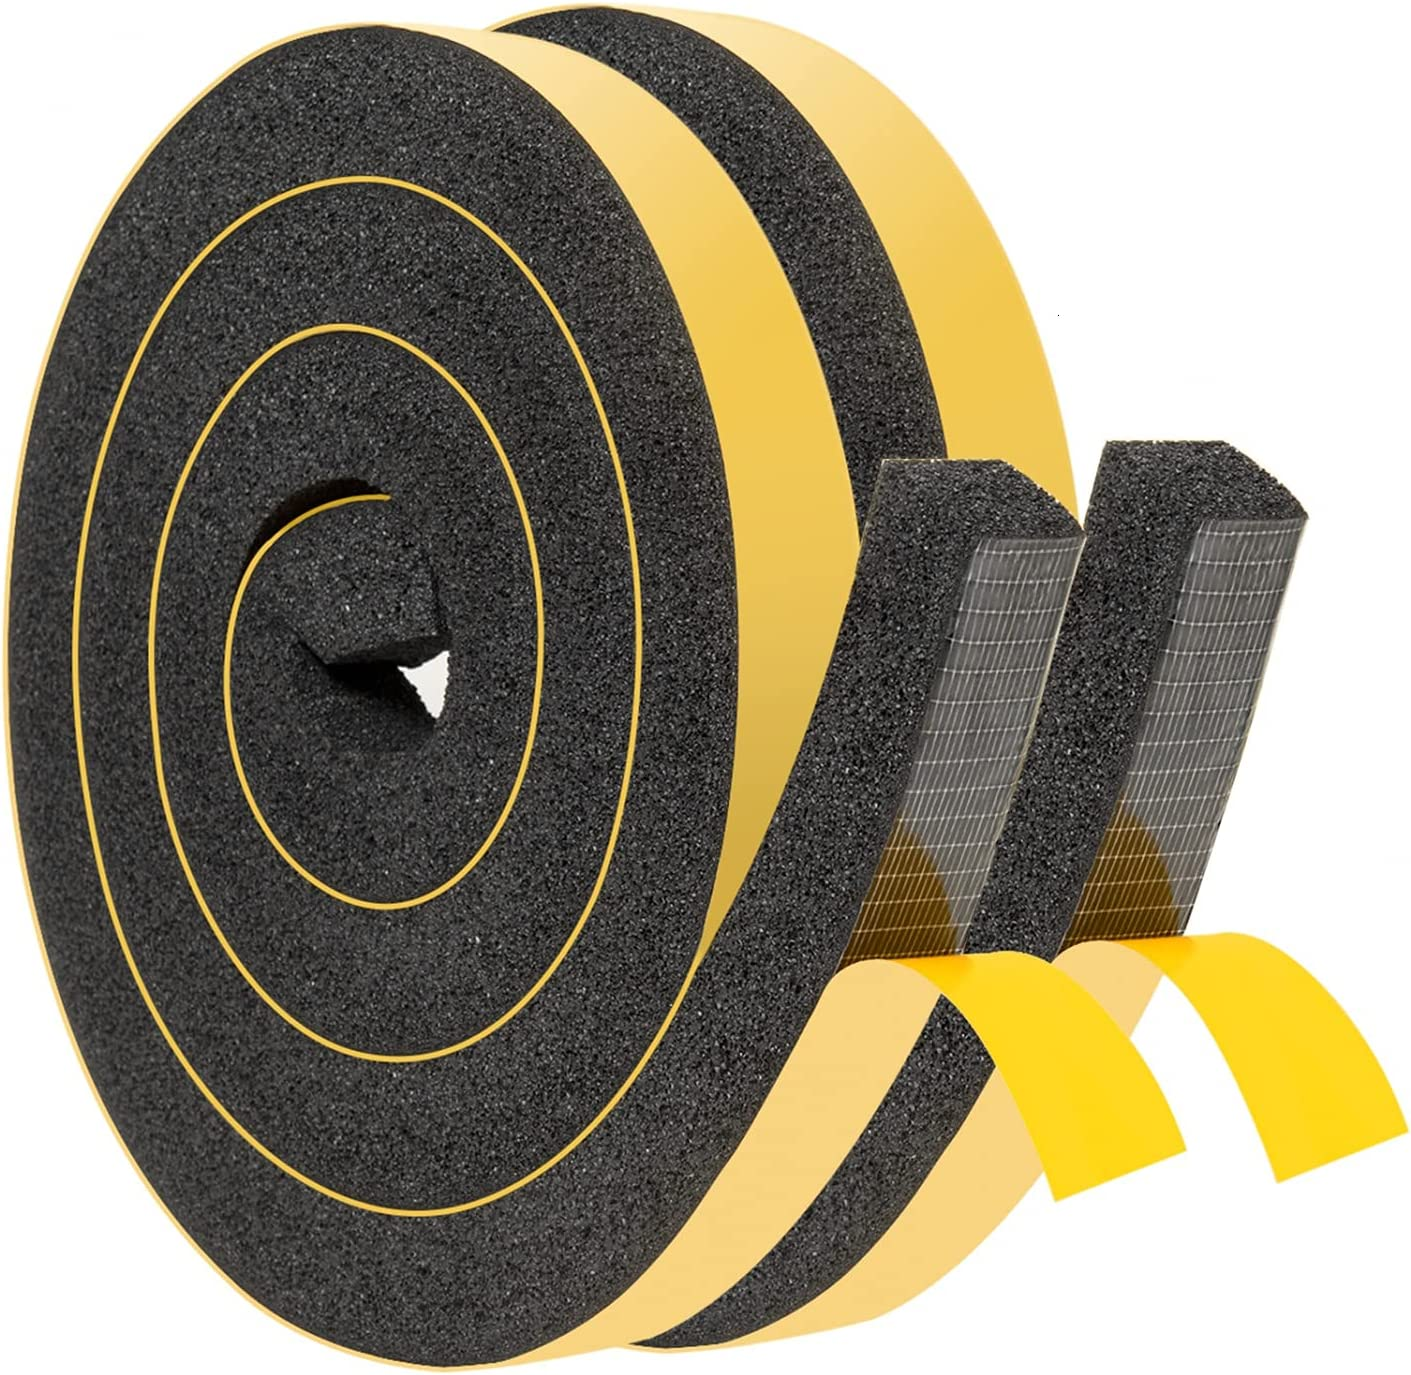 YoleShy Window Air Conditioner Foam Tape 2 Pcs 1 Inch Wide x 1 Inch Thick Weather Stripping Door Seal Strip for Insulation, Weatherstrip, Gap Blocker,Total 13 Feet Long(6.5ft x 2 Rolls)